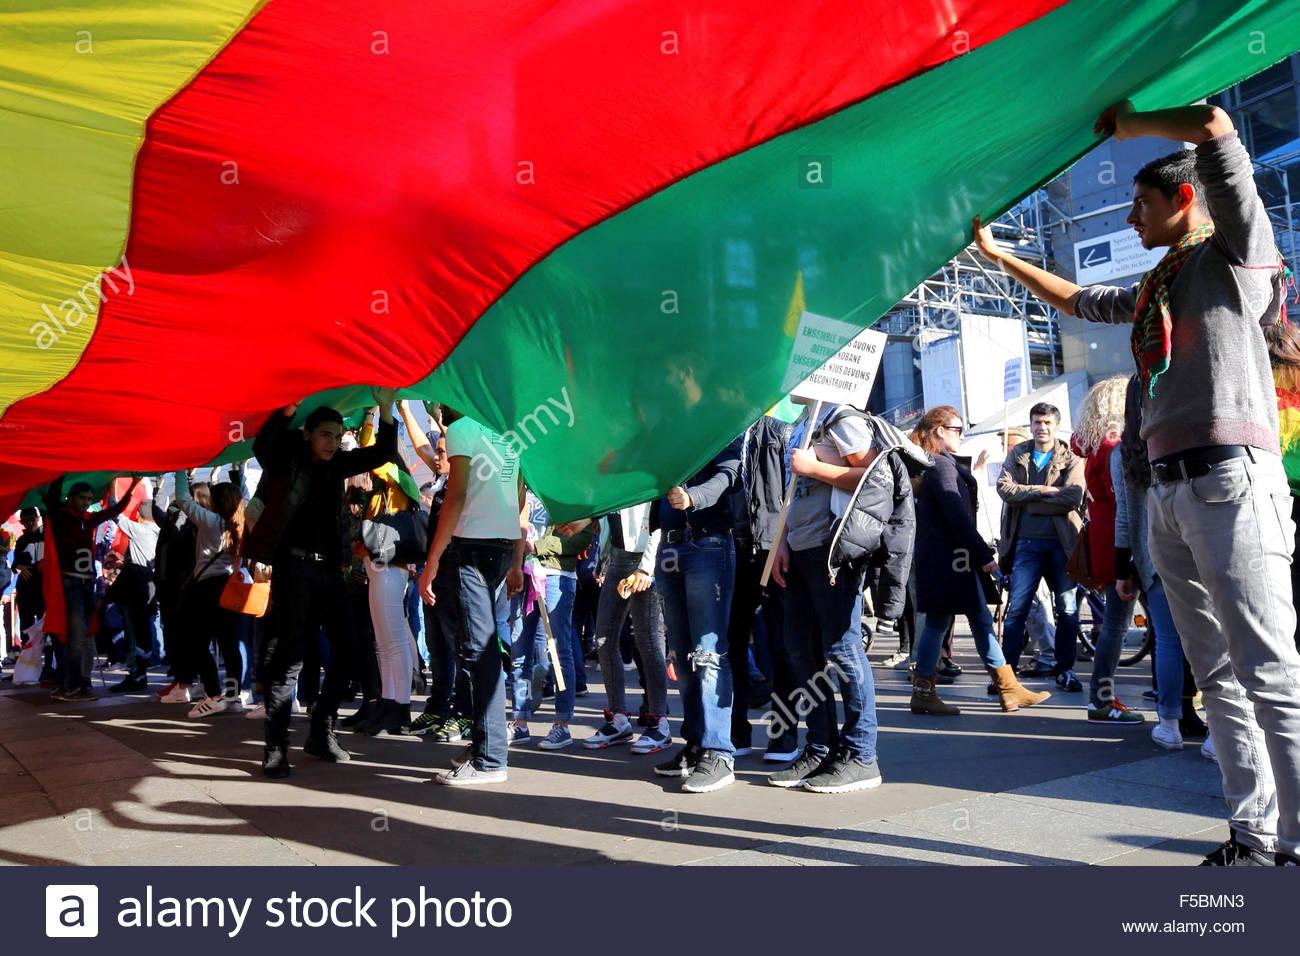 Paris, France. novembre 1st, 2015. FRANCE, Paris: People hold the kurdish flag during a pro kurdish demonstration Stock Photo